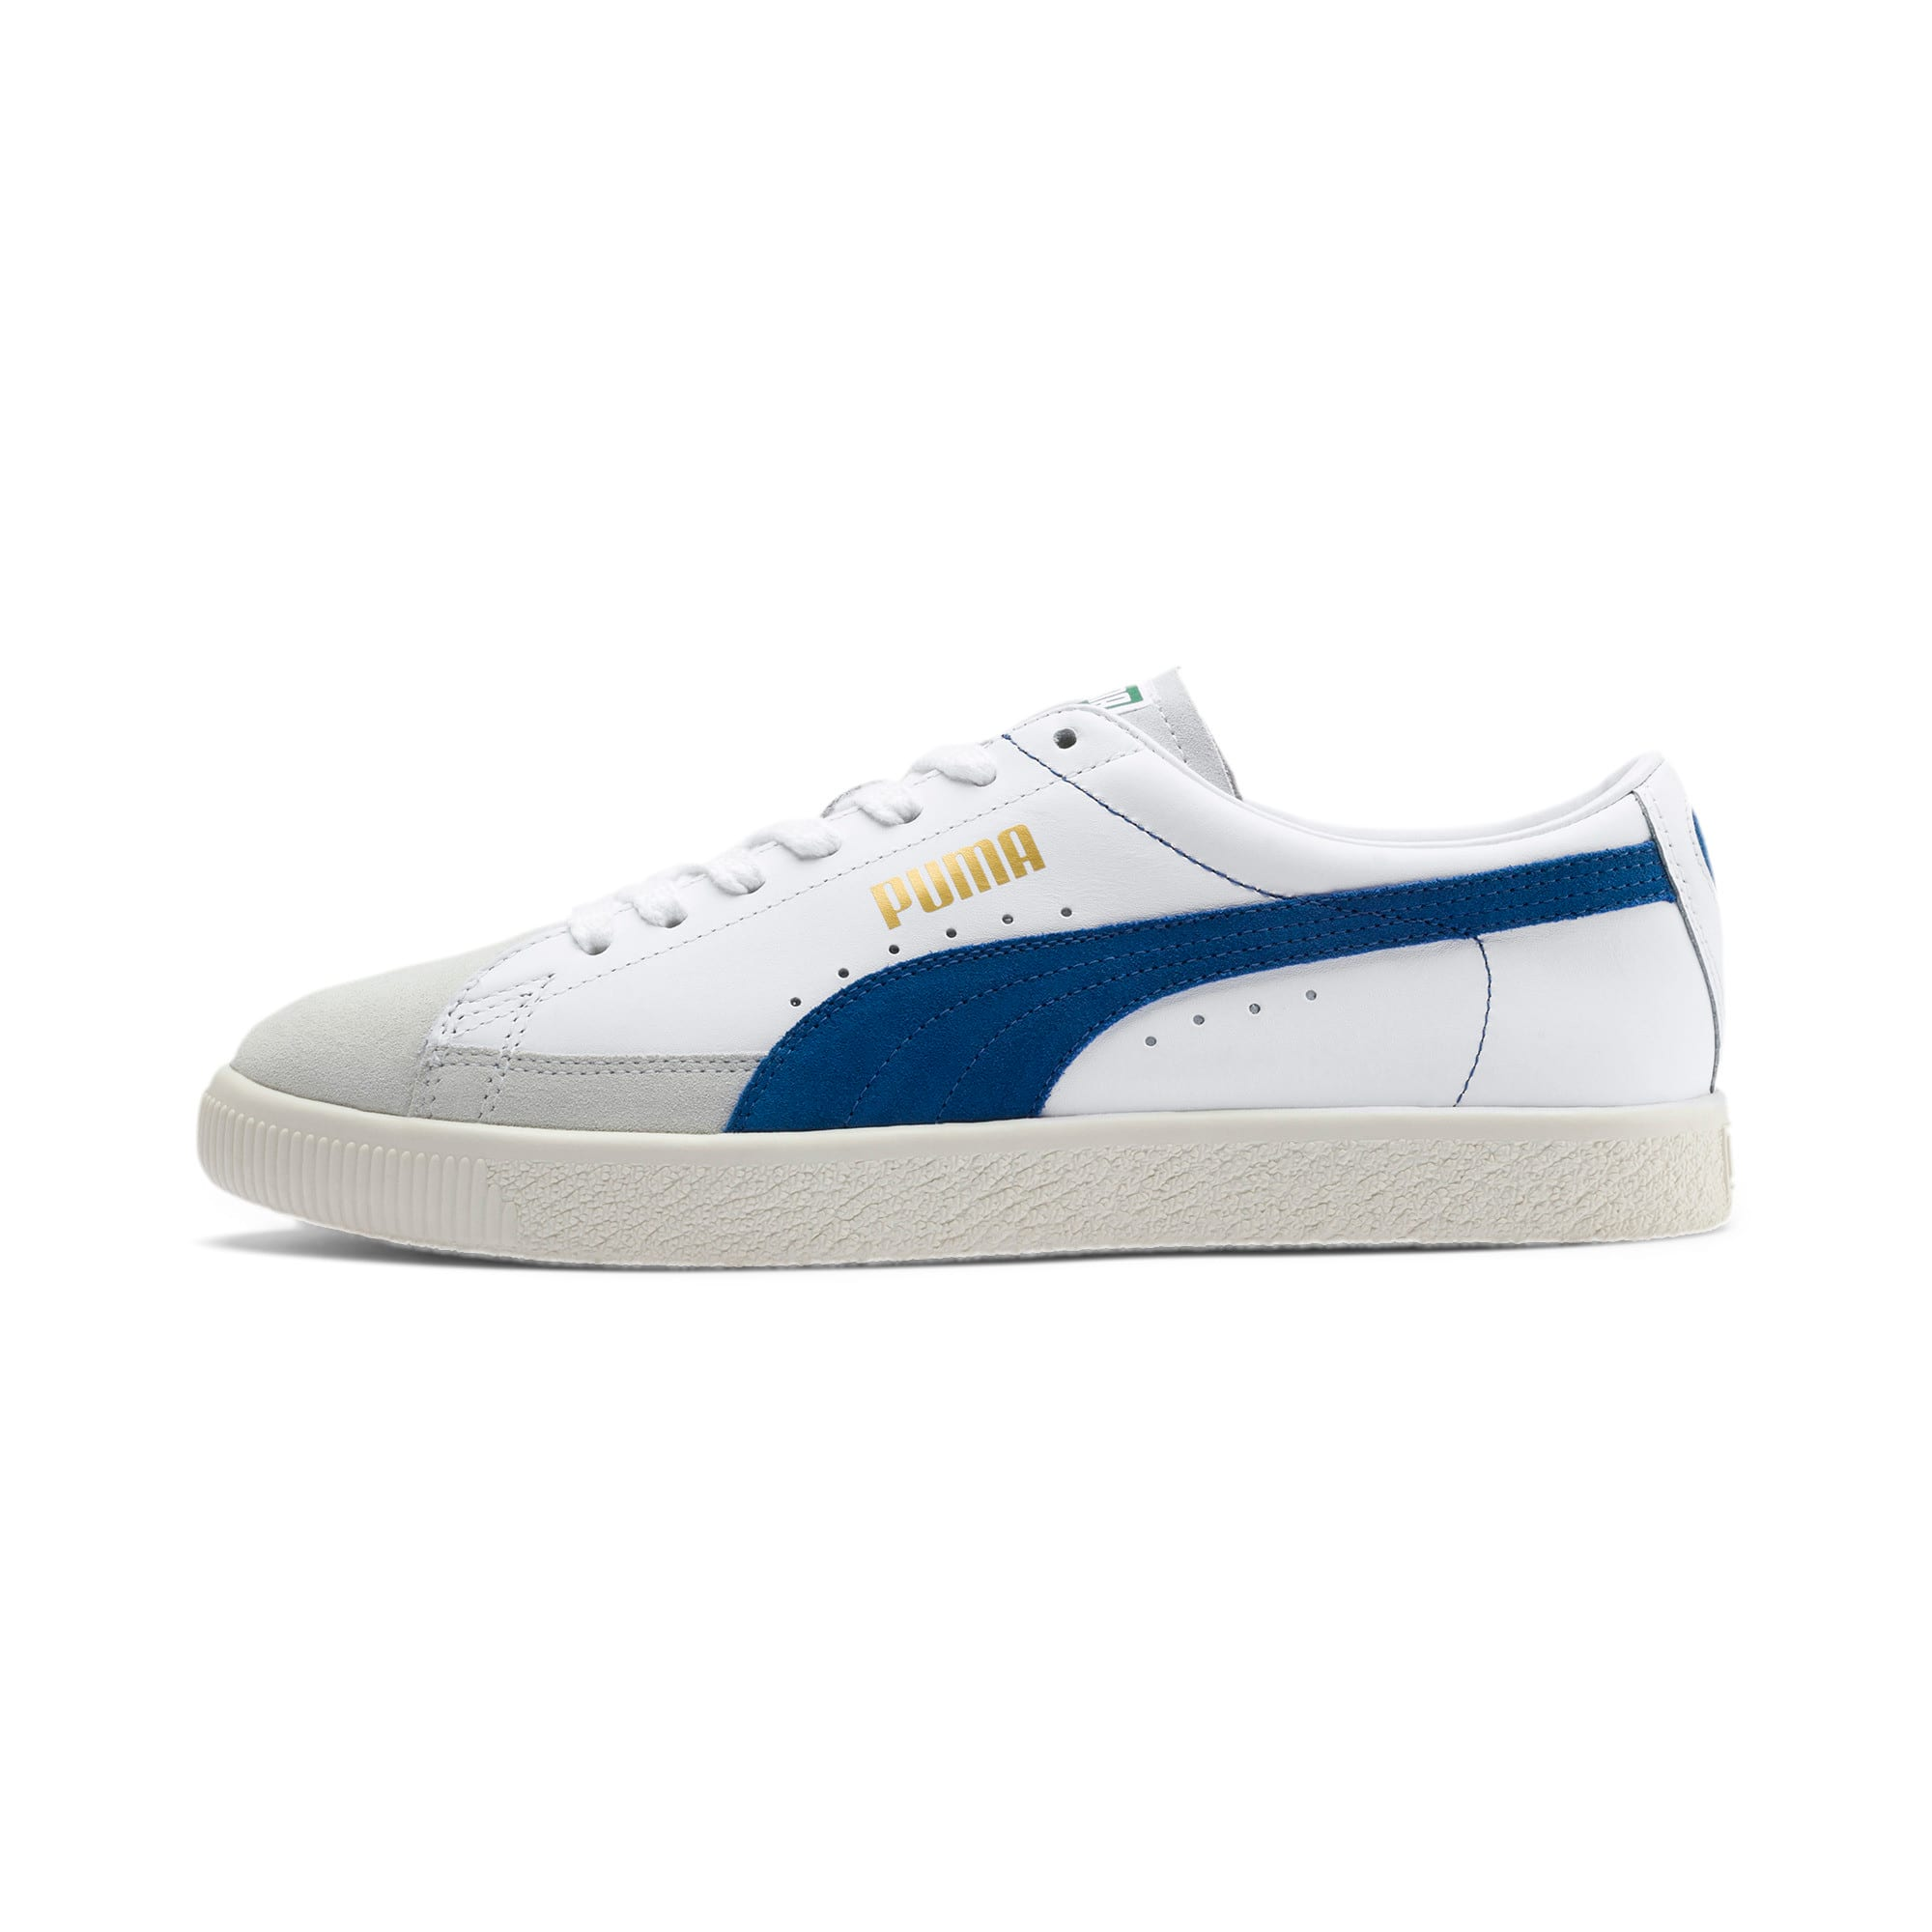 Thumbnail 1 of Basket 90680 Sneakers, Puma White-Galaxy Blue-Whisp, medium